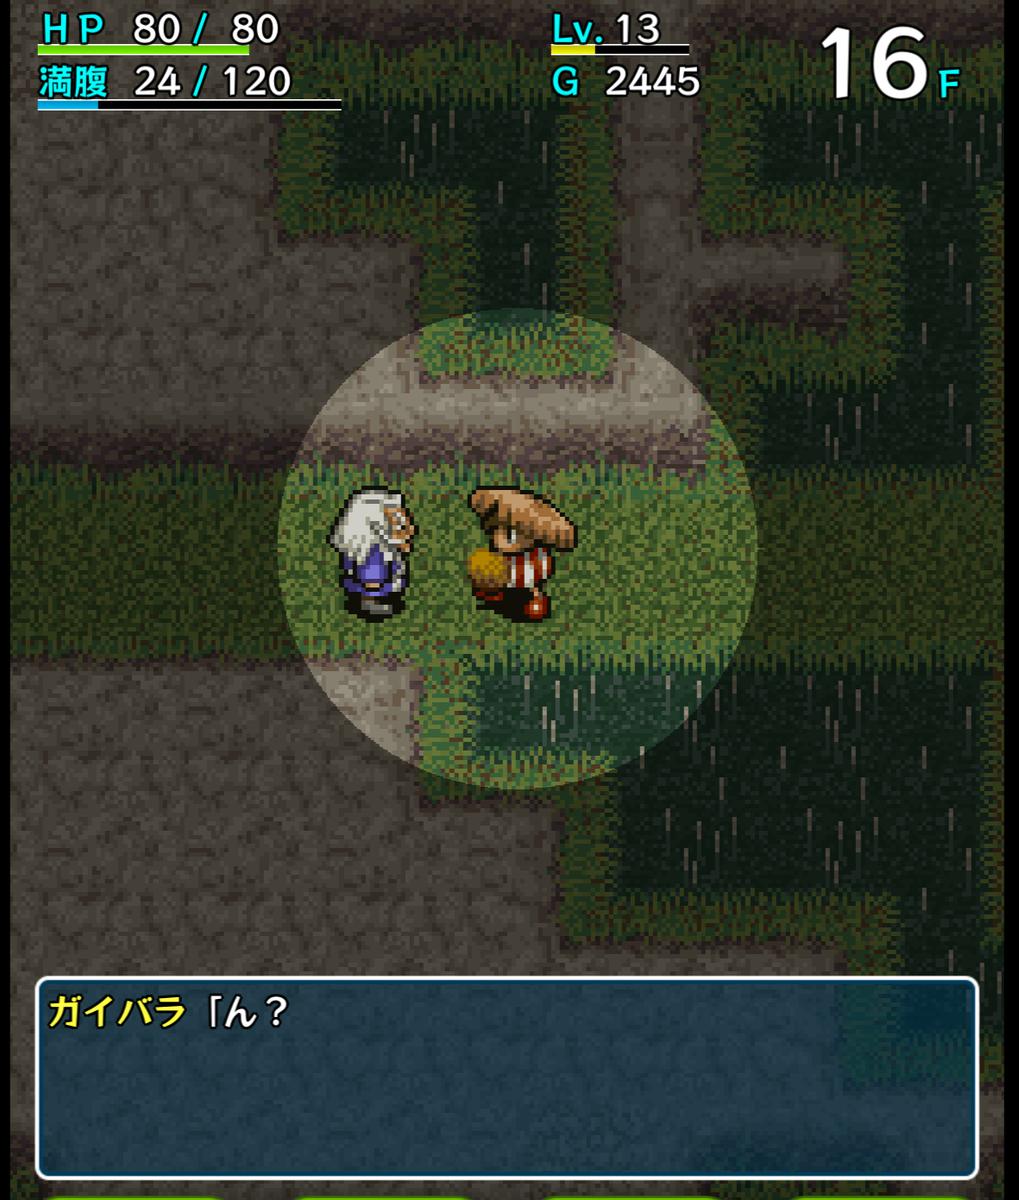 f:id:game-bakari:20190608224834p:plain